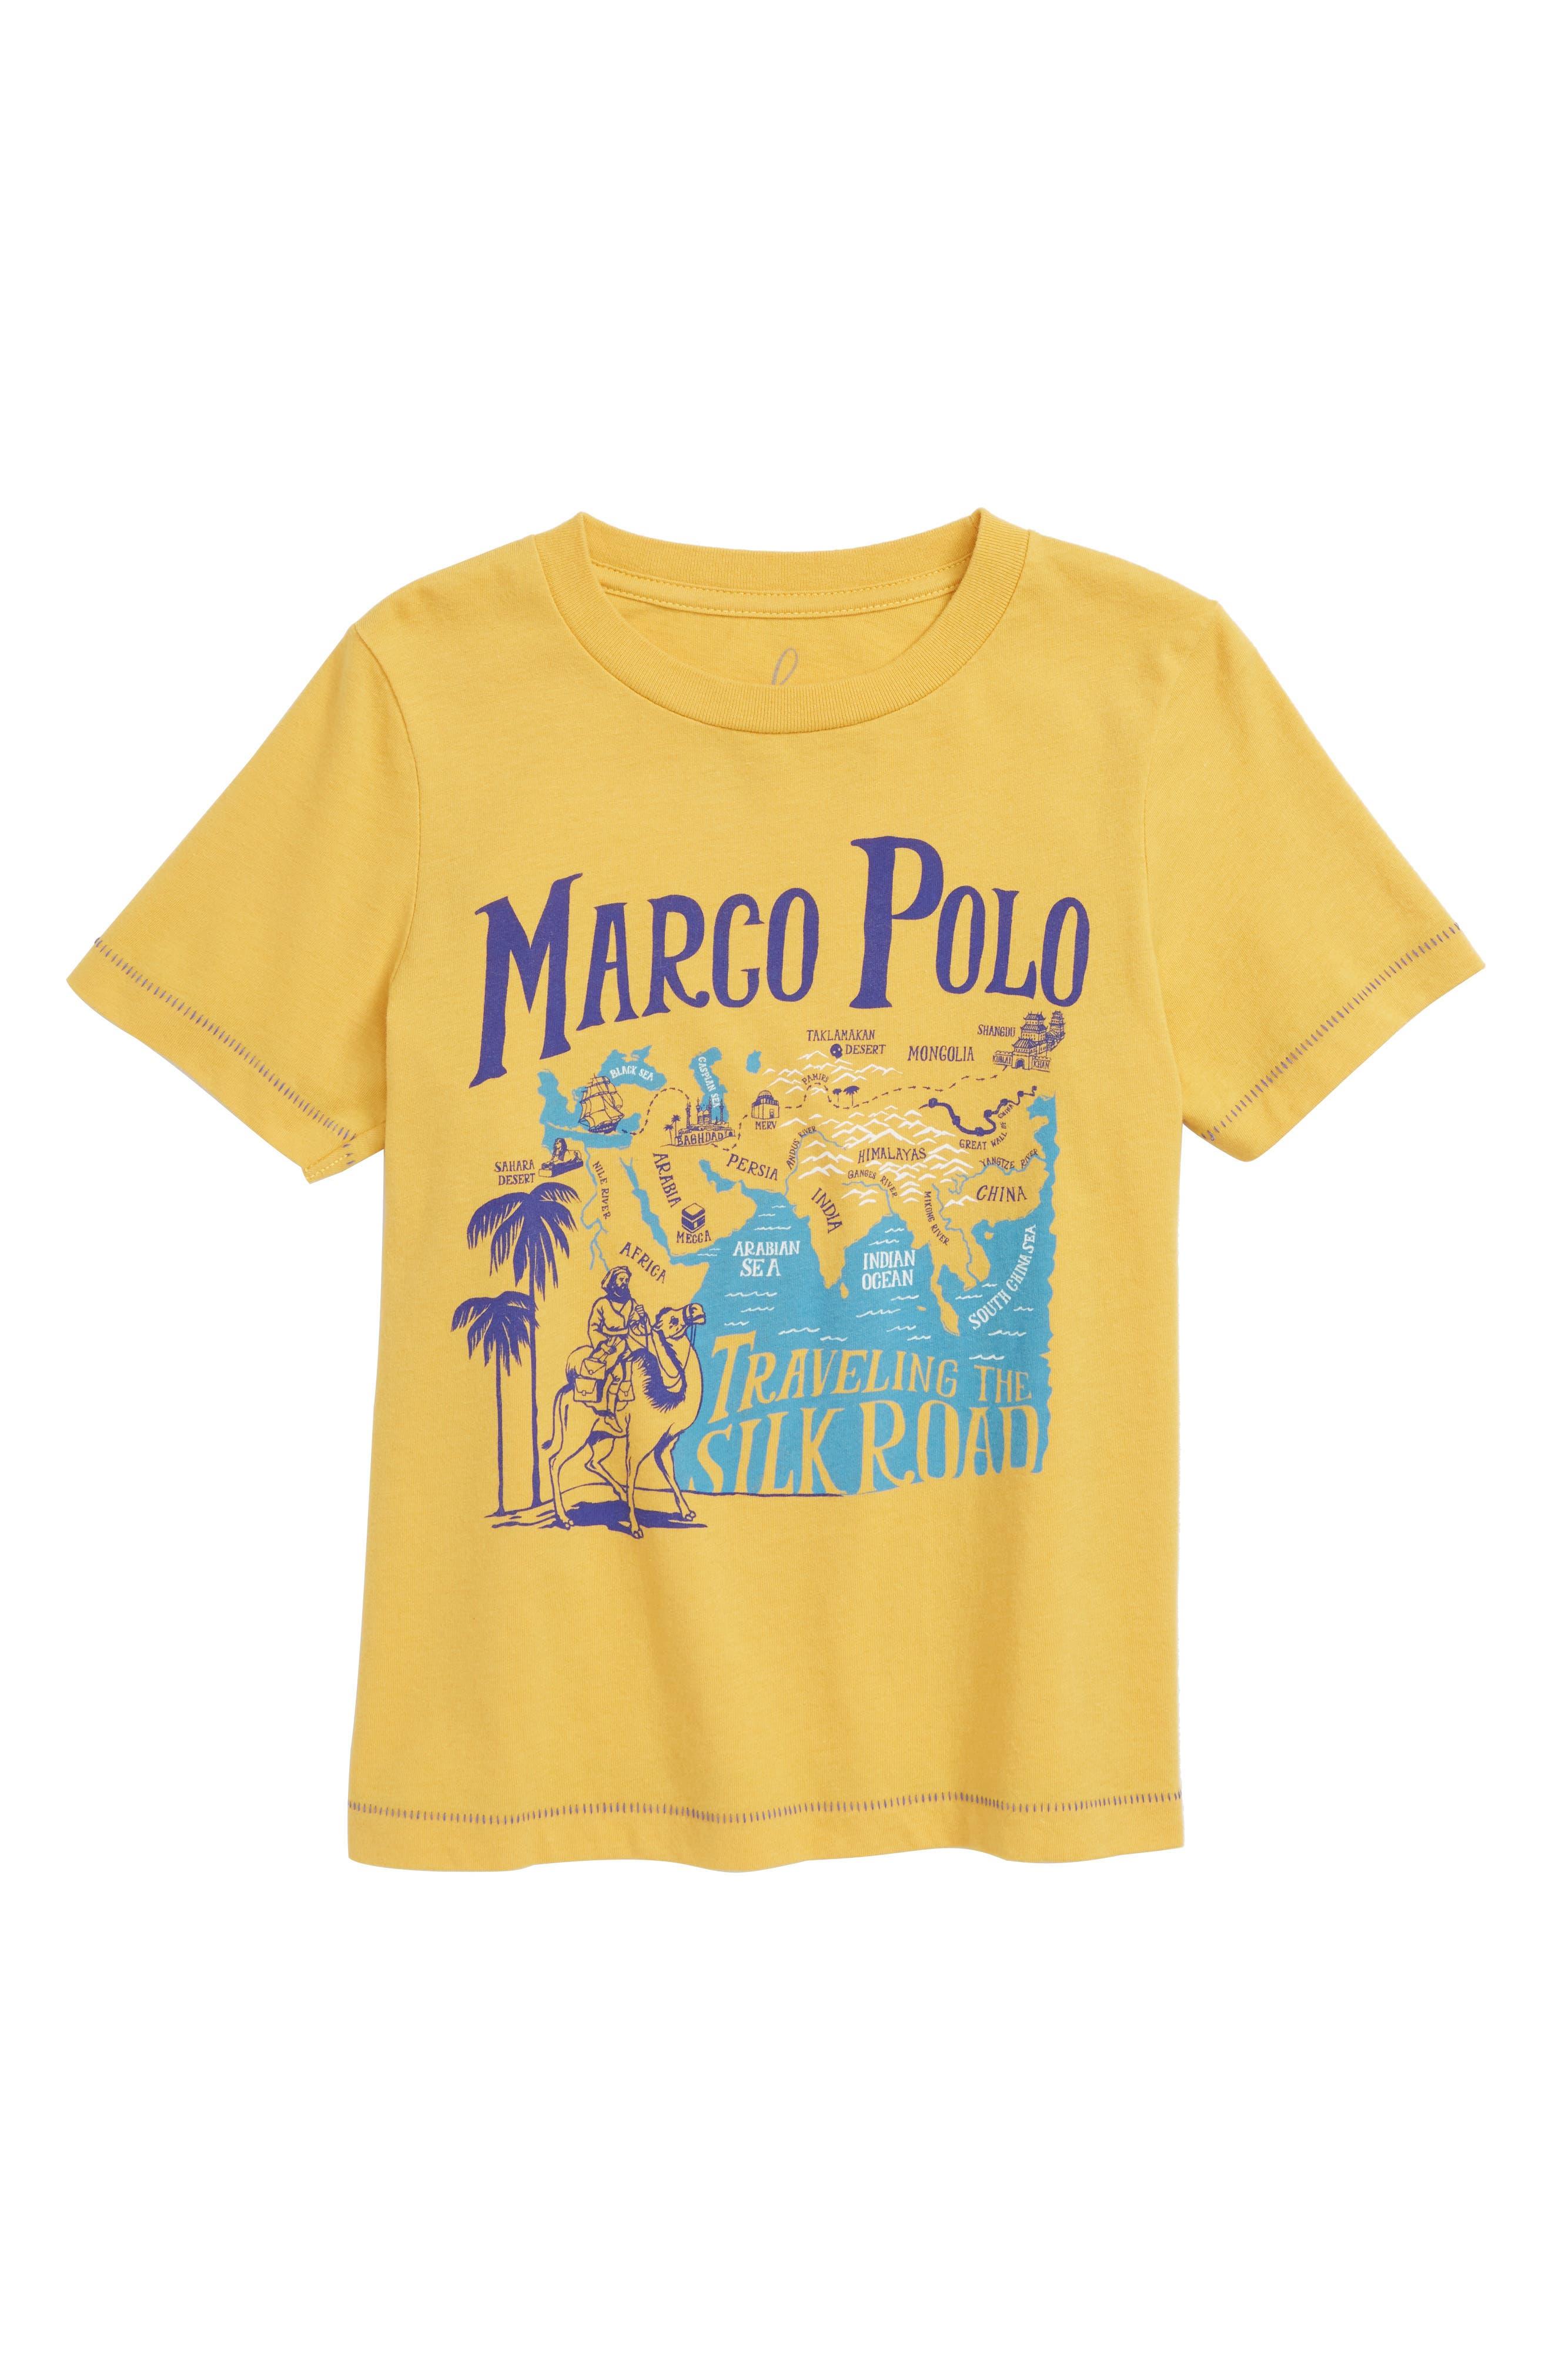 Silk Road T-Shirt,                         Main,                         color, MUSTARD